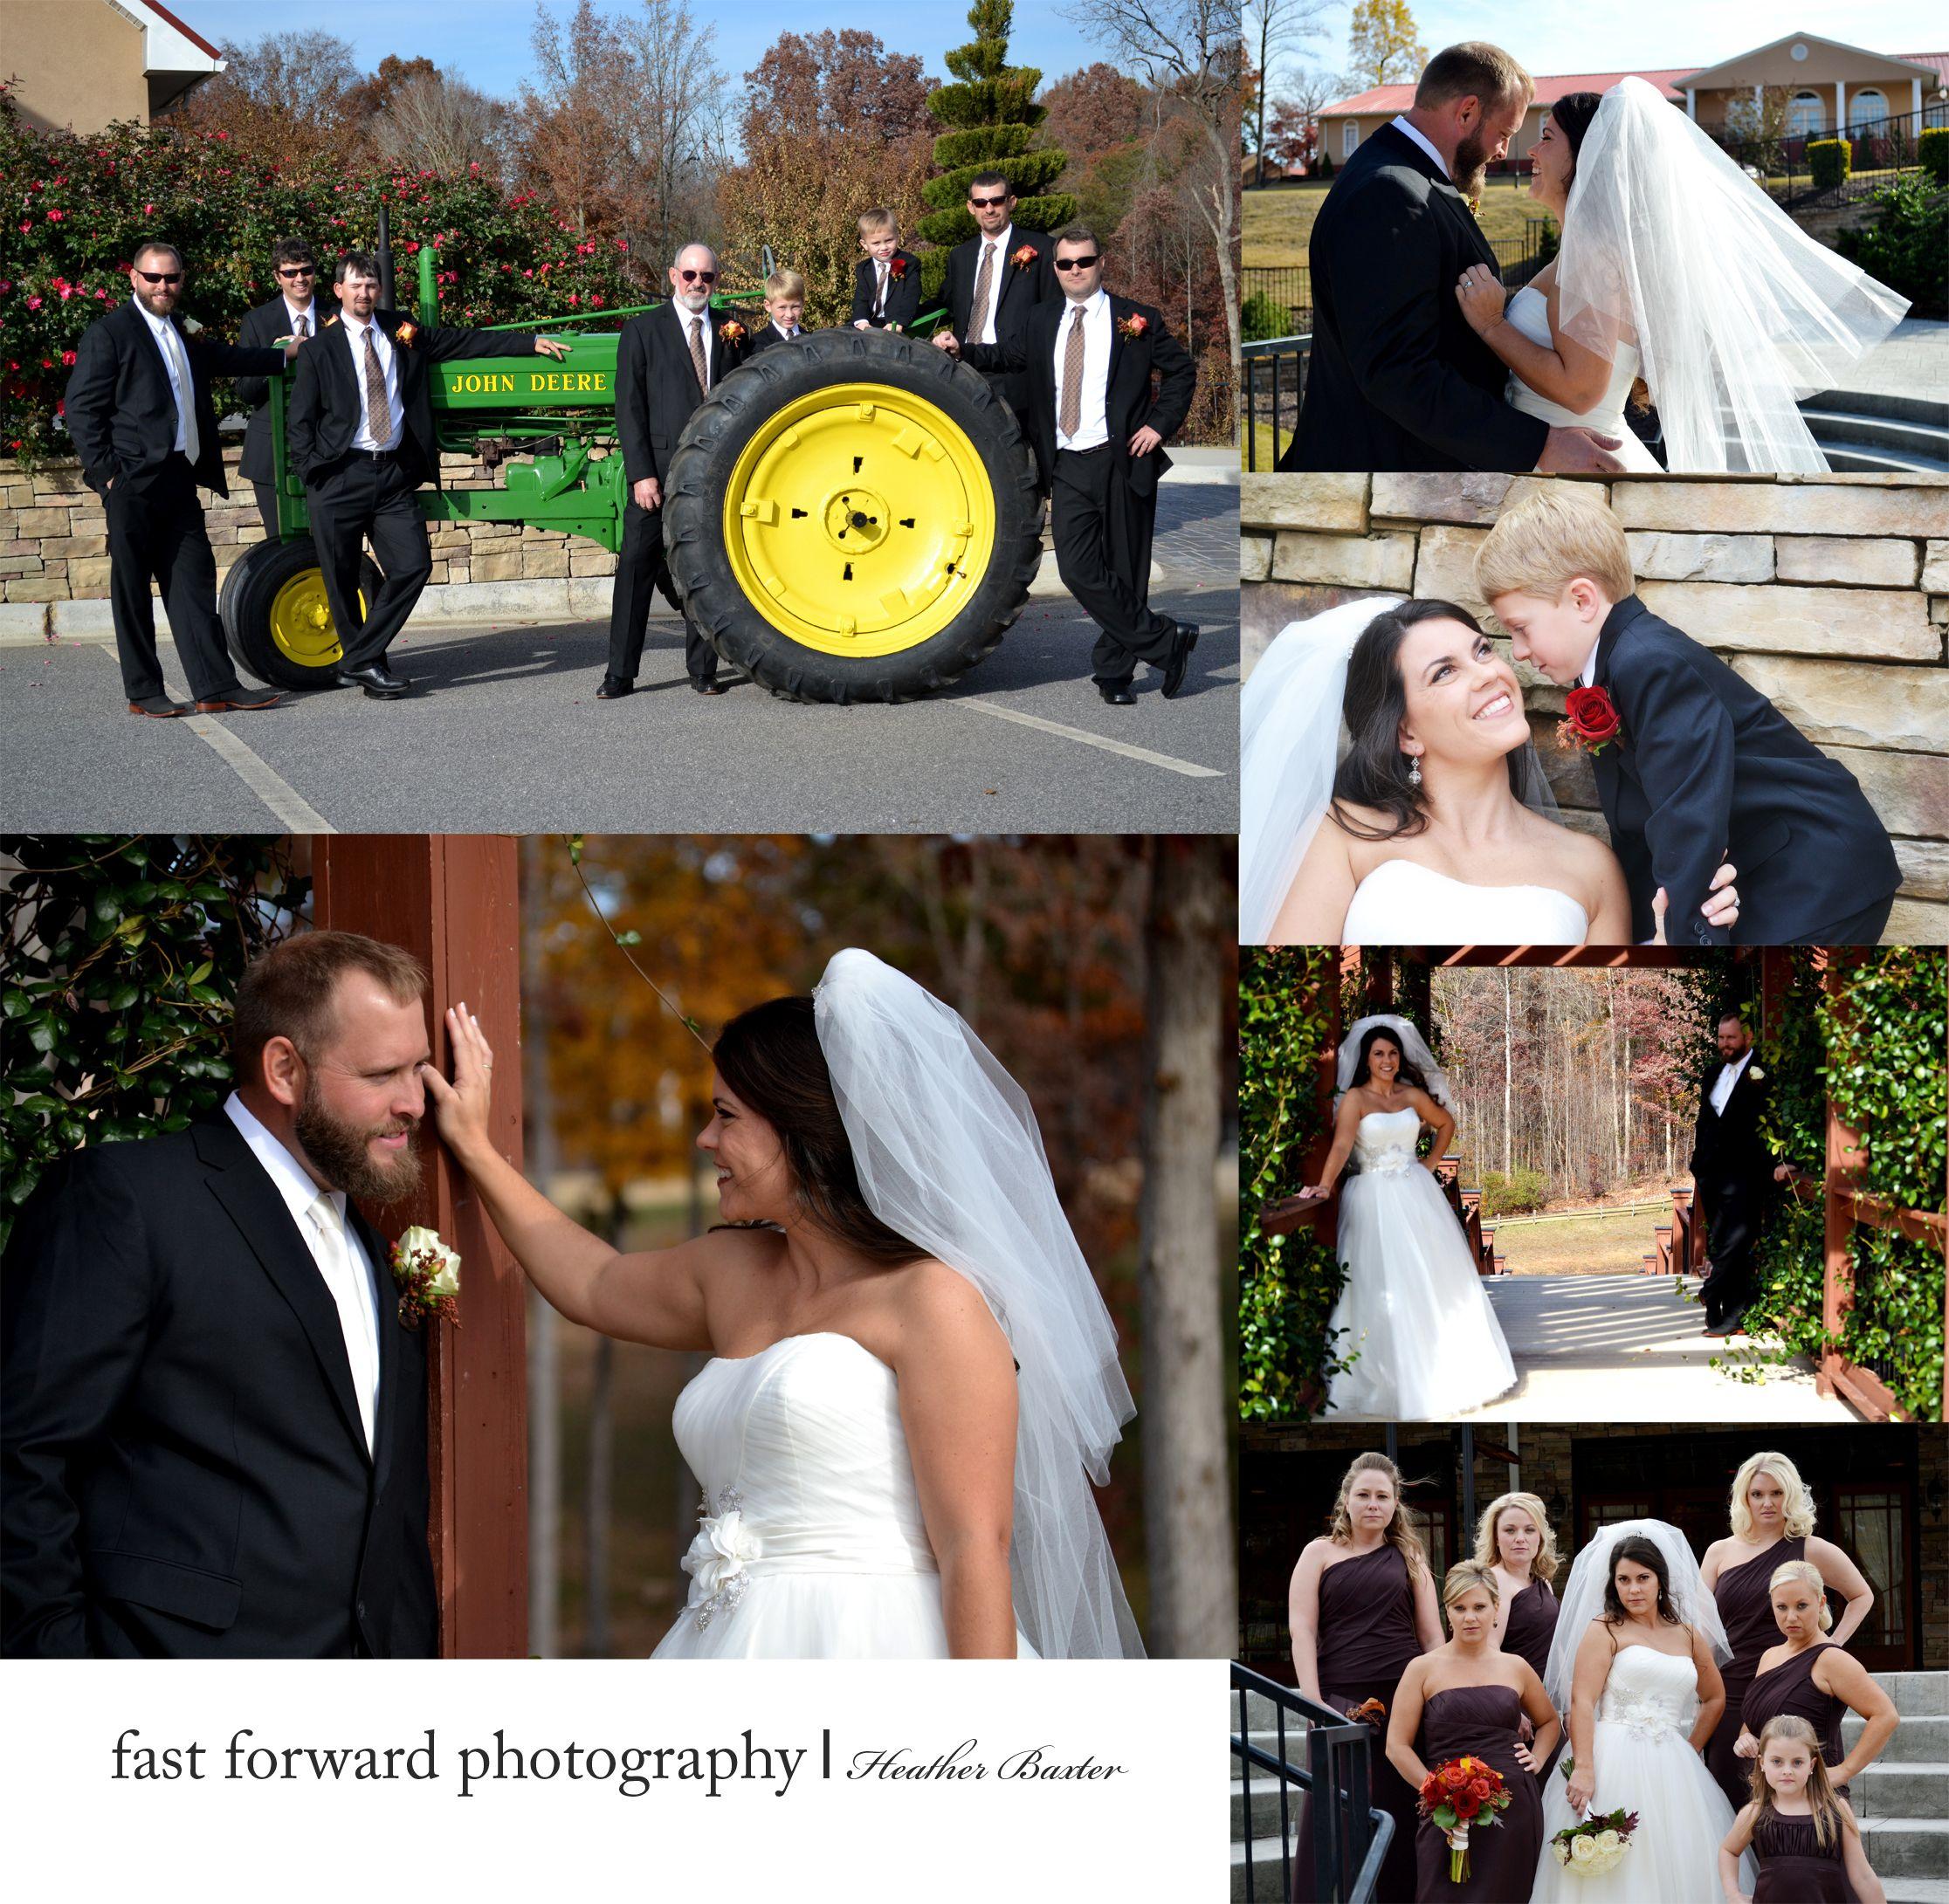 Camo and orange wedding dresses  wedding photography brown bridesmaid dress bride veil john deer